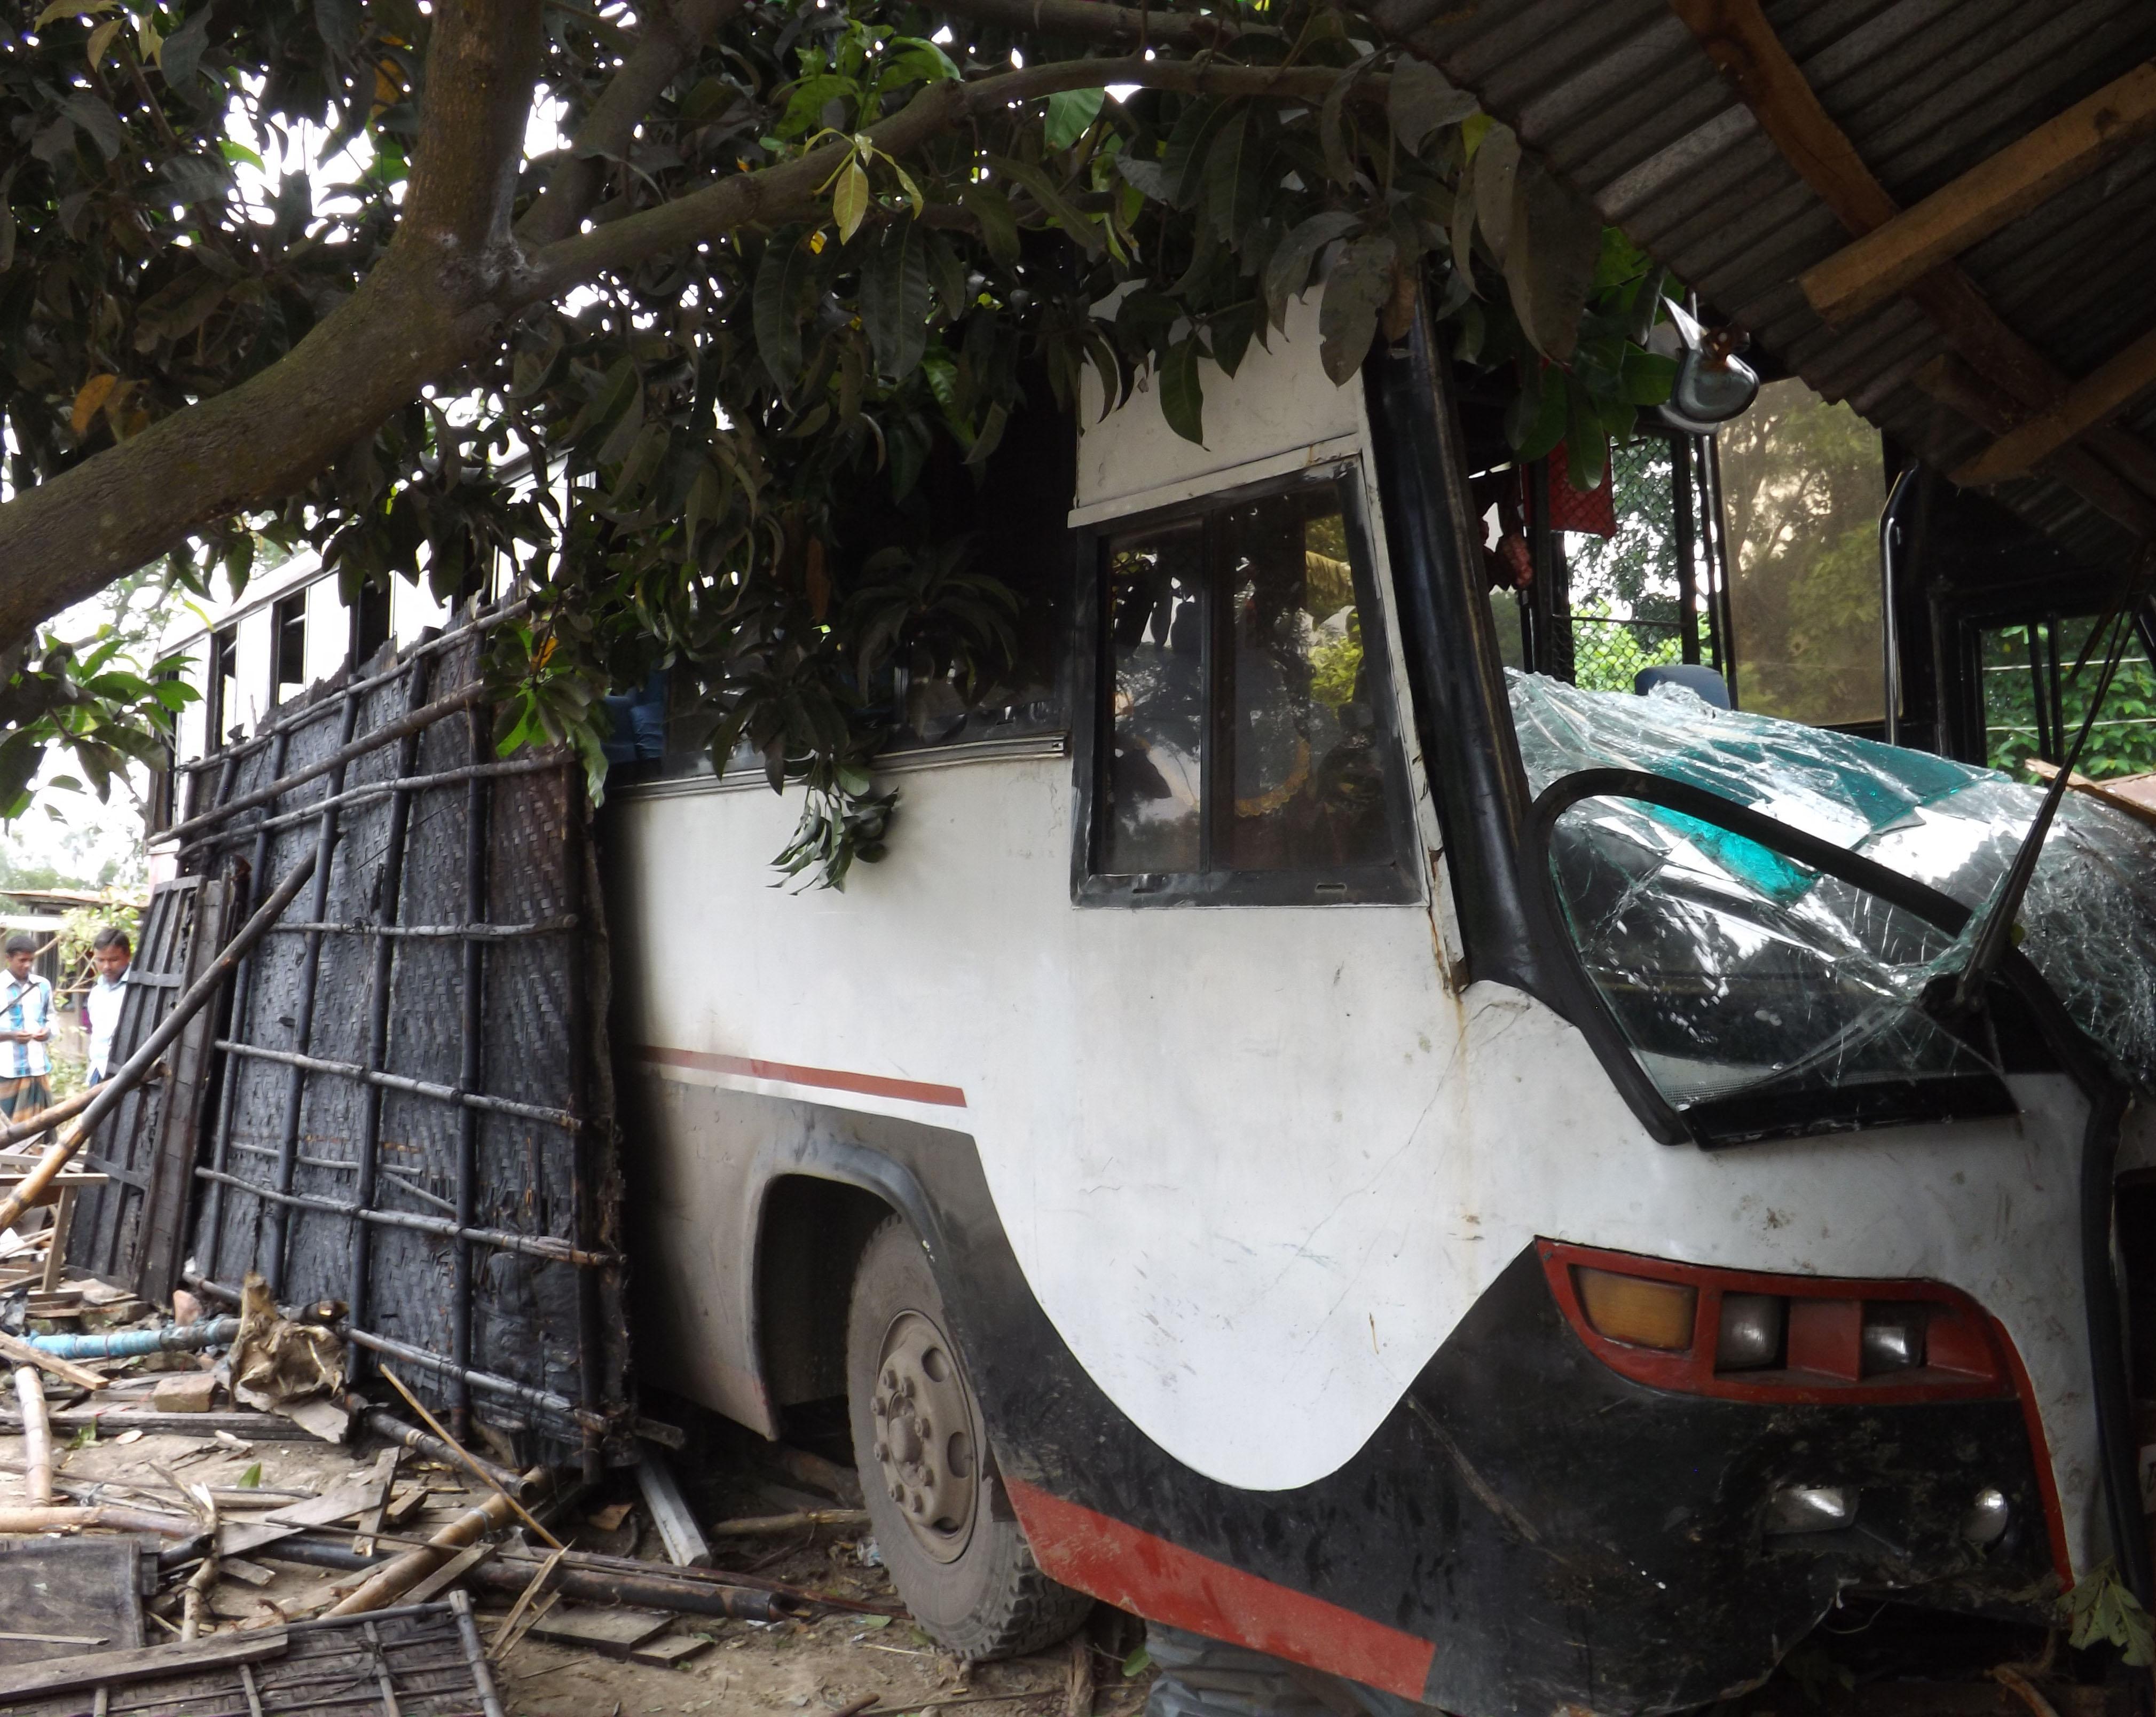 Thak accident pic